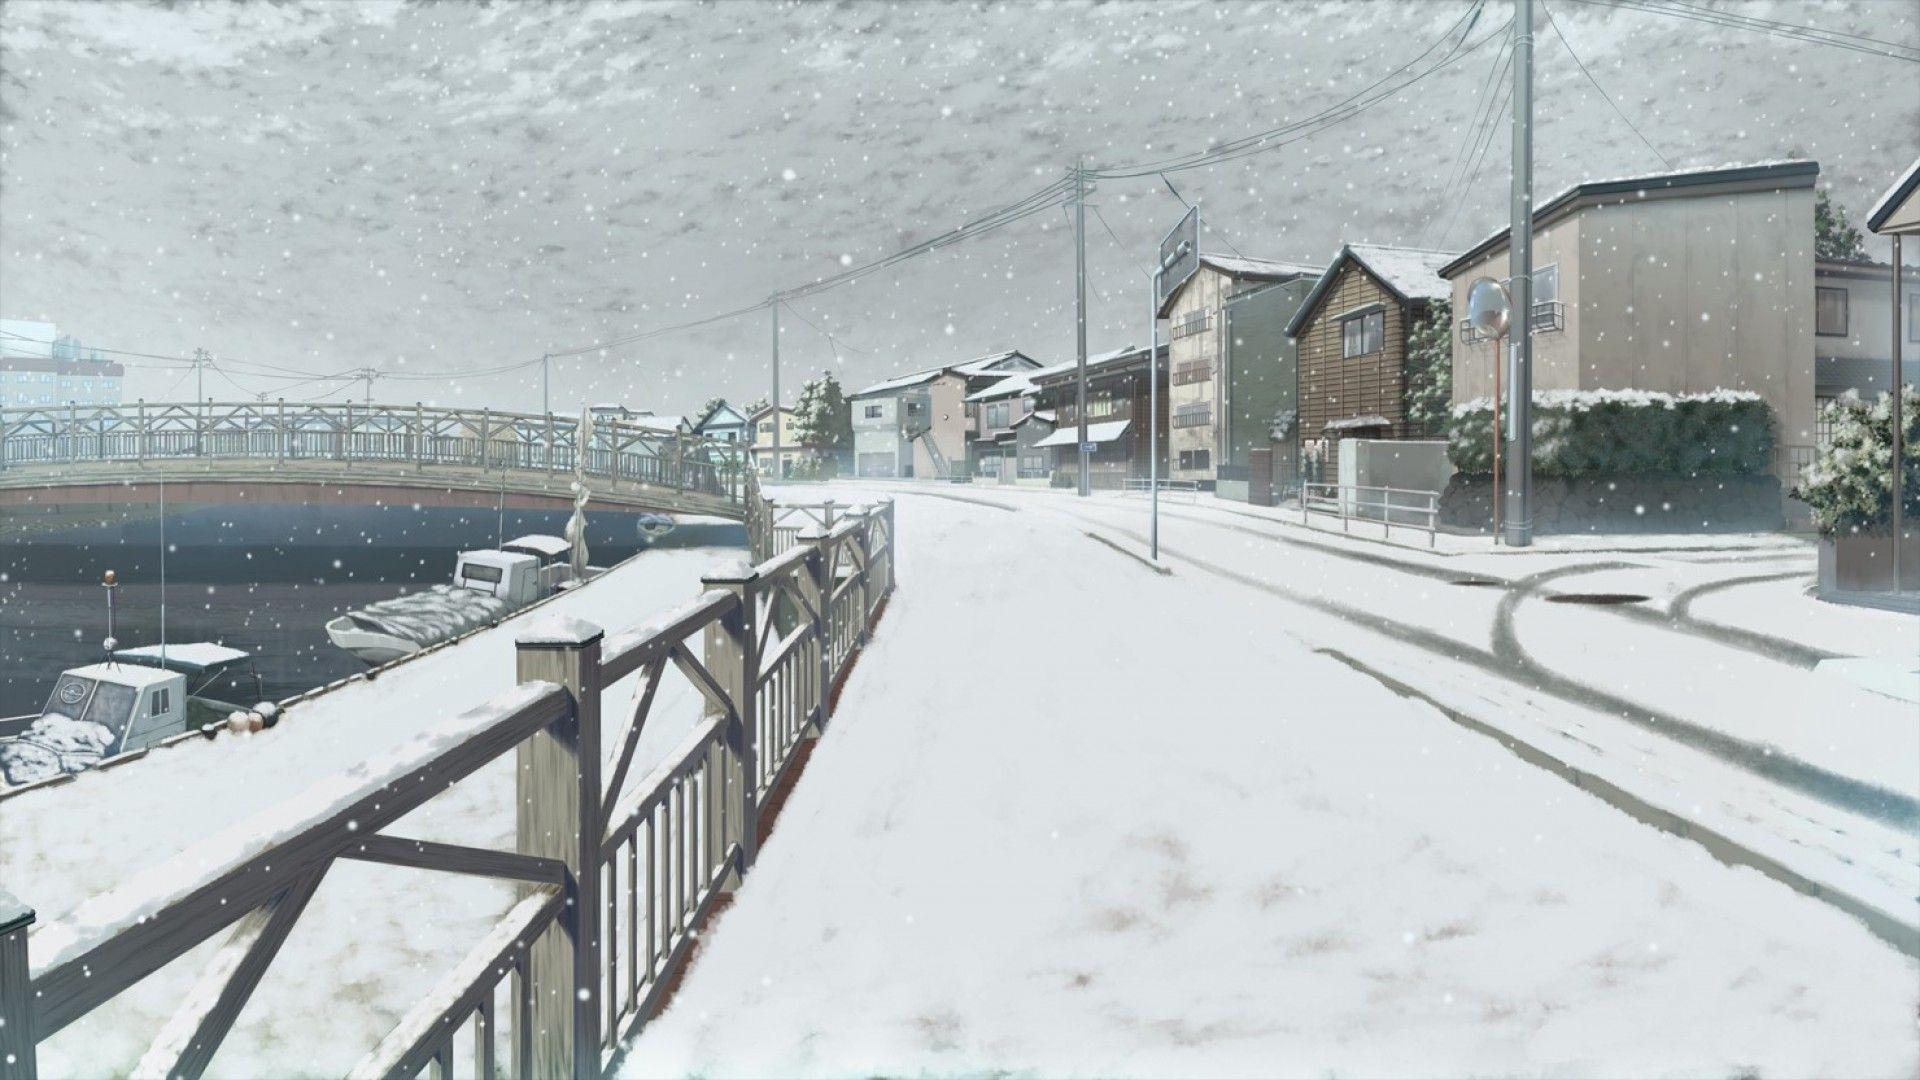 Anime Winter Scenery Hd Wallpaper 1920x1080 Id 58283 Scenery Wallpaper Anime Scenery Winter Scenery